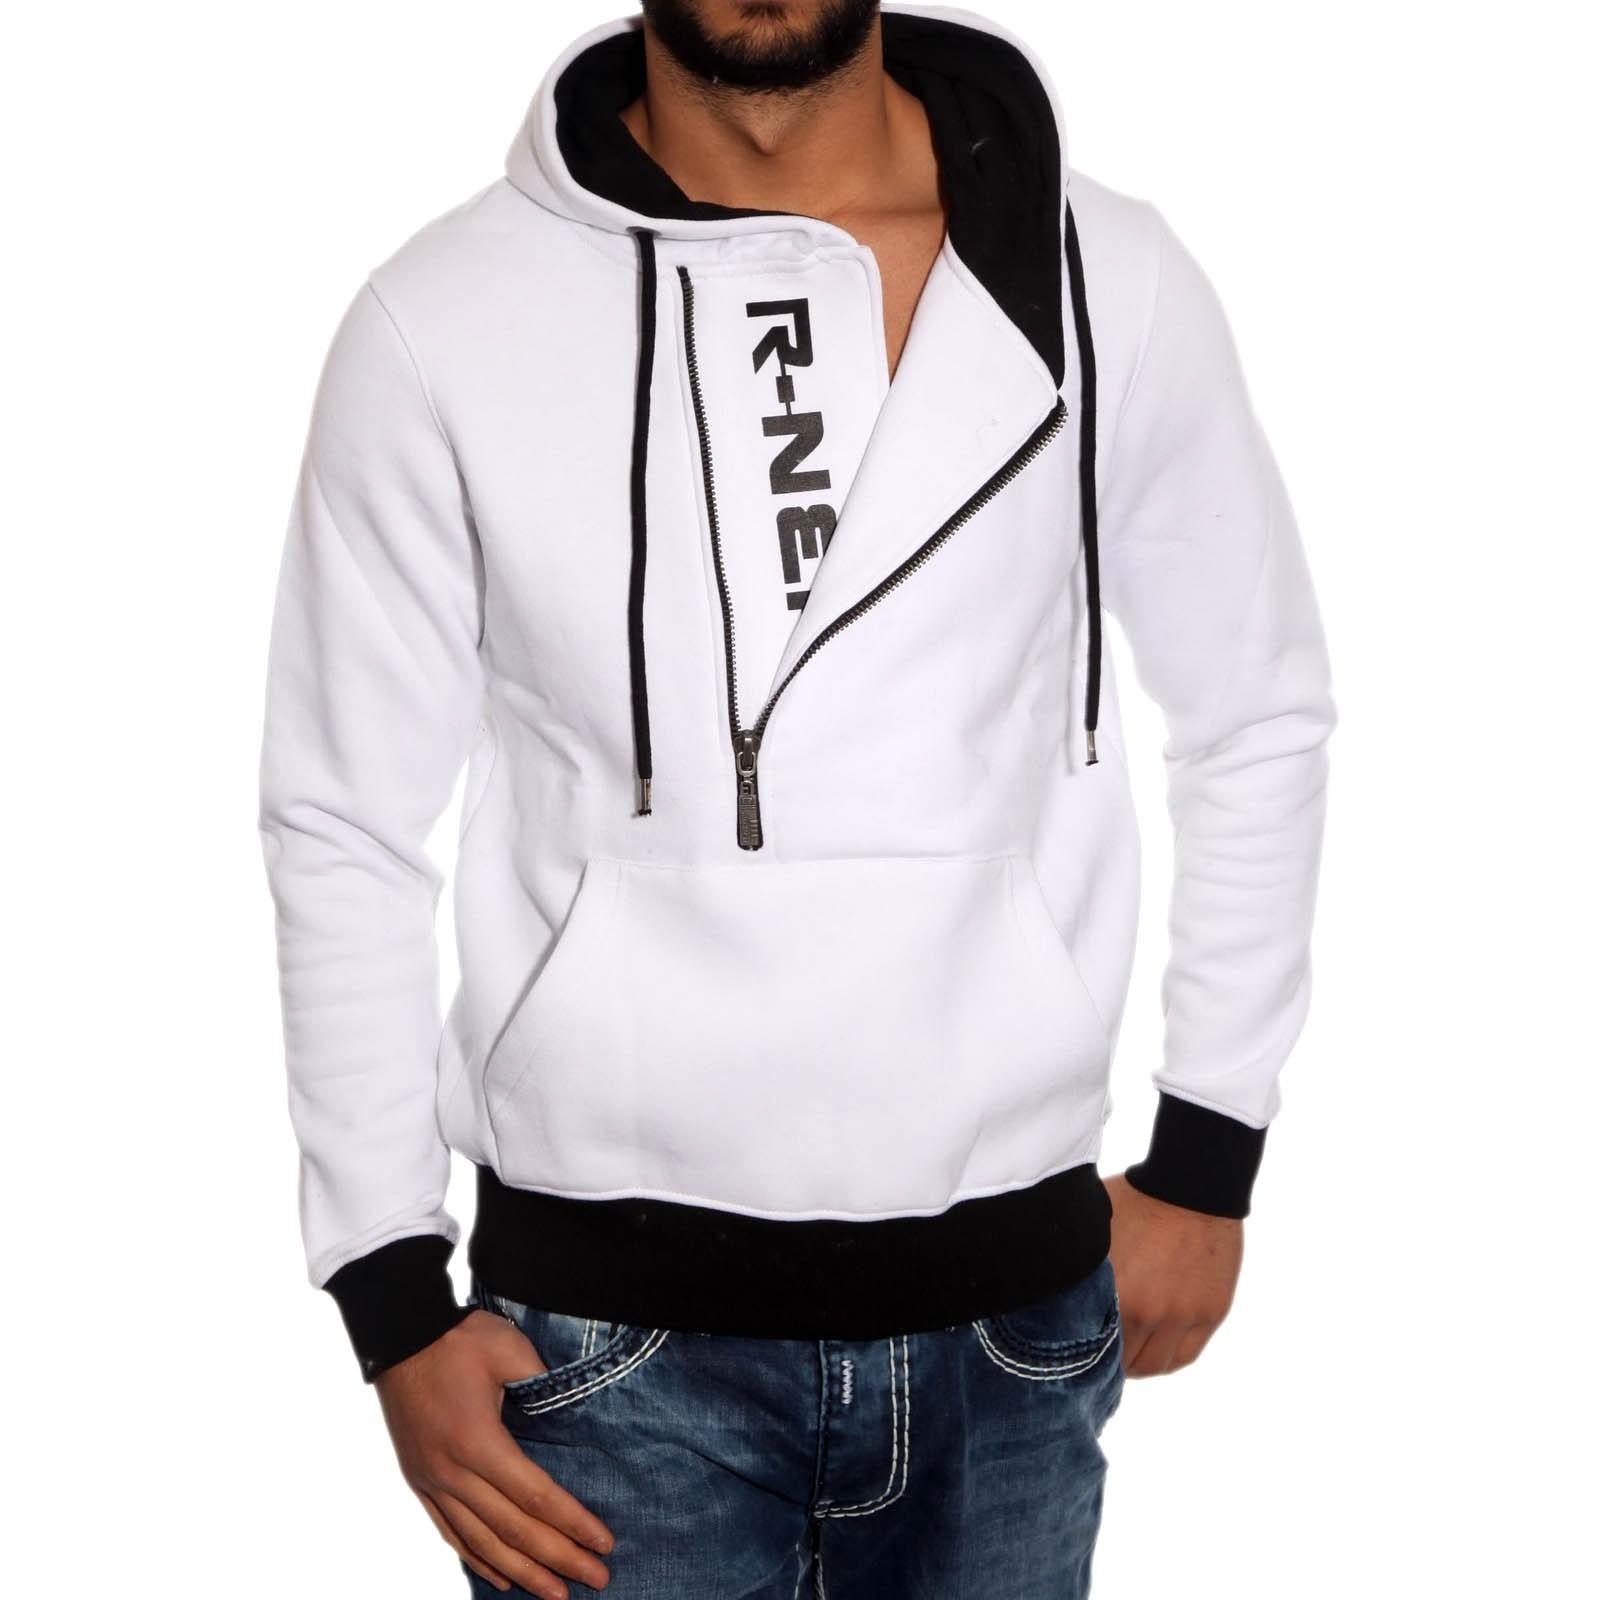 Sweatshirt 7006-1 R-Neal